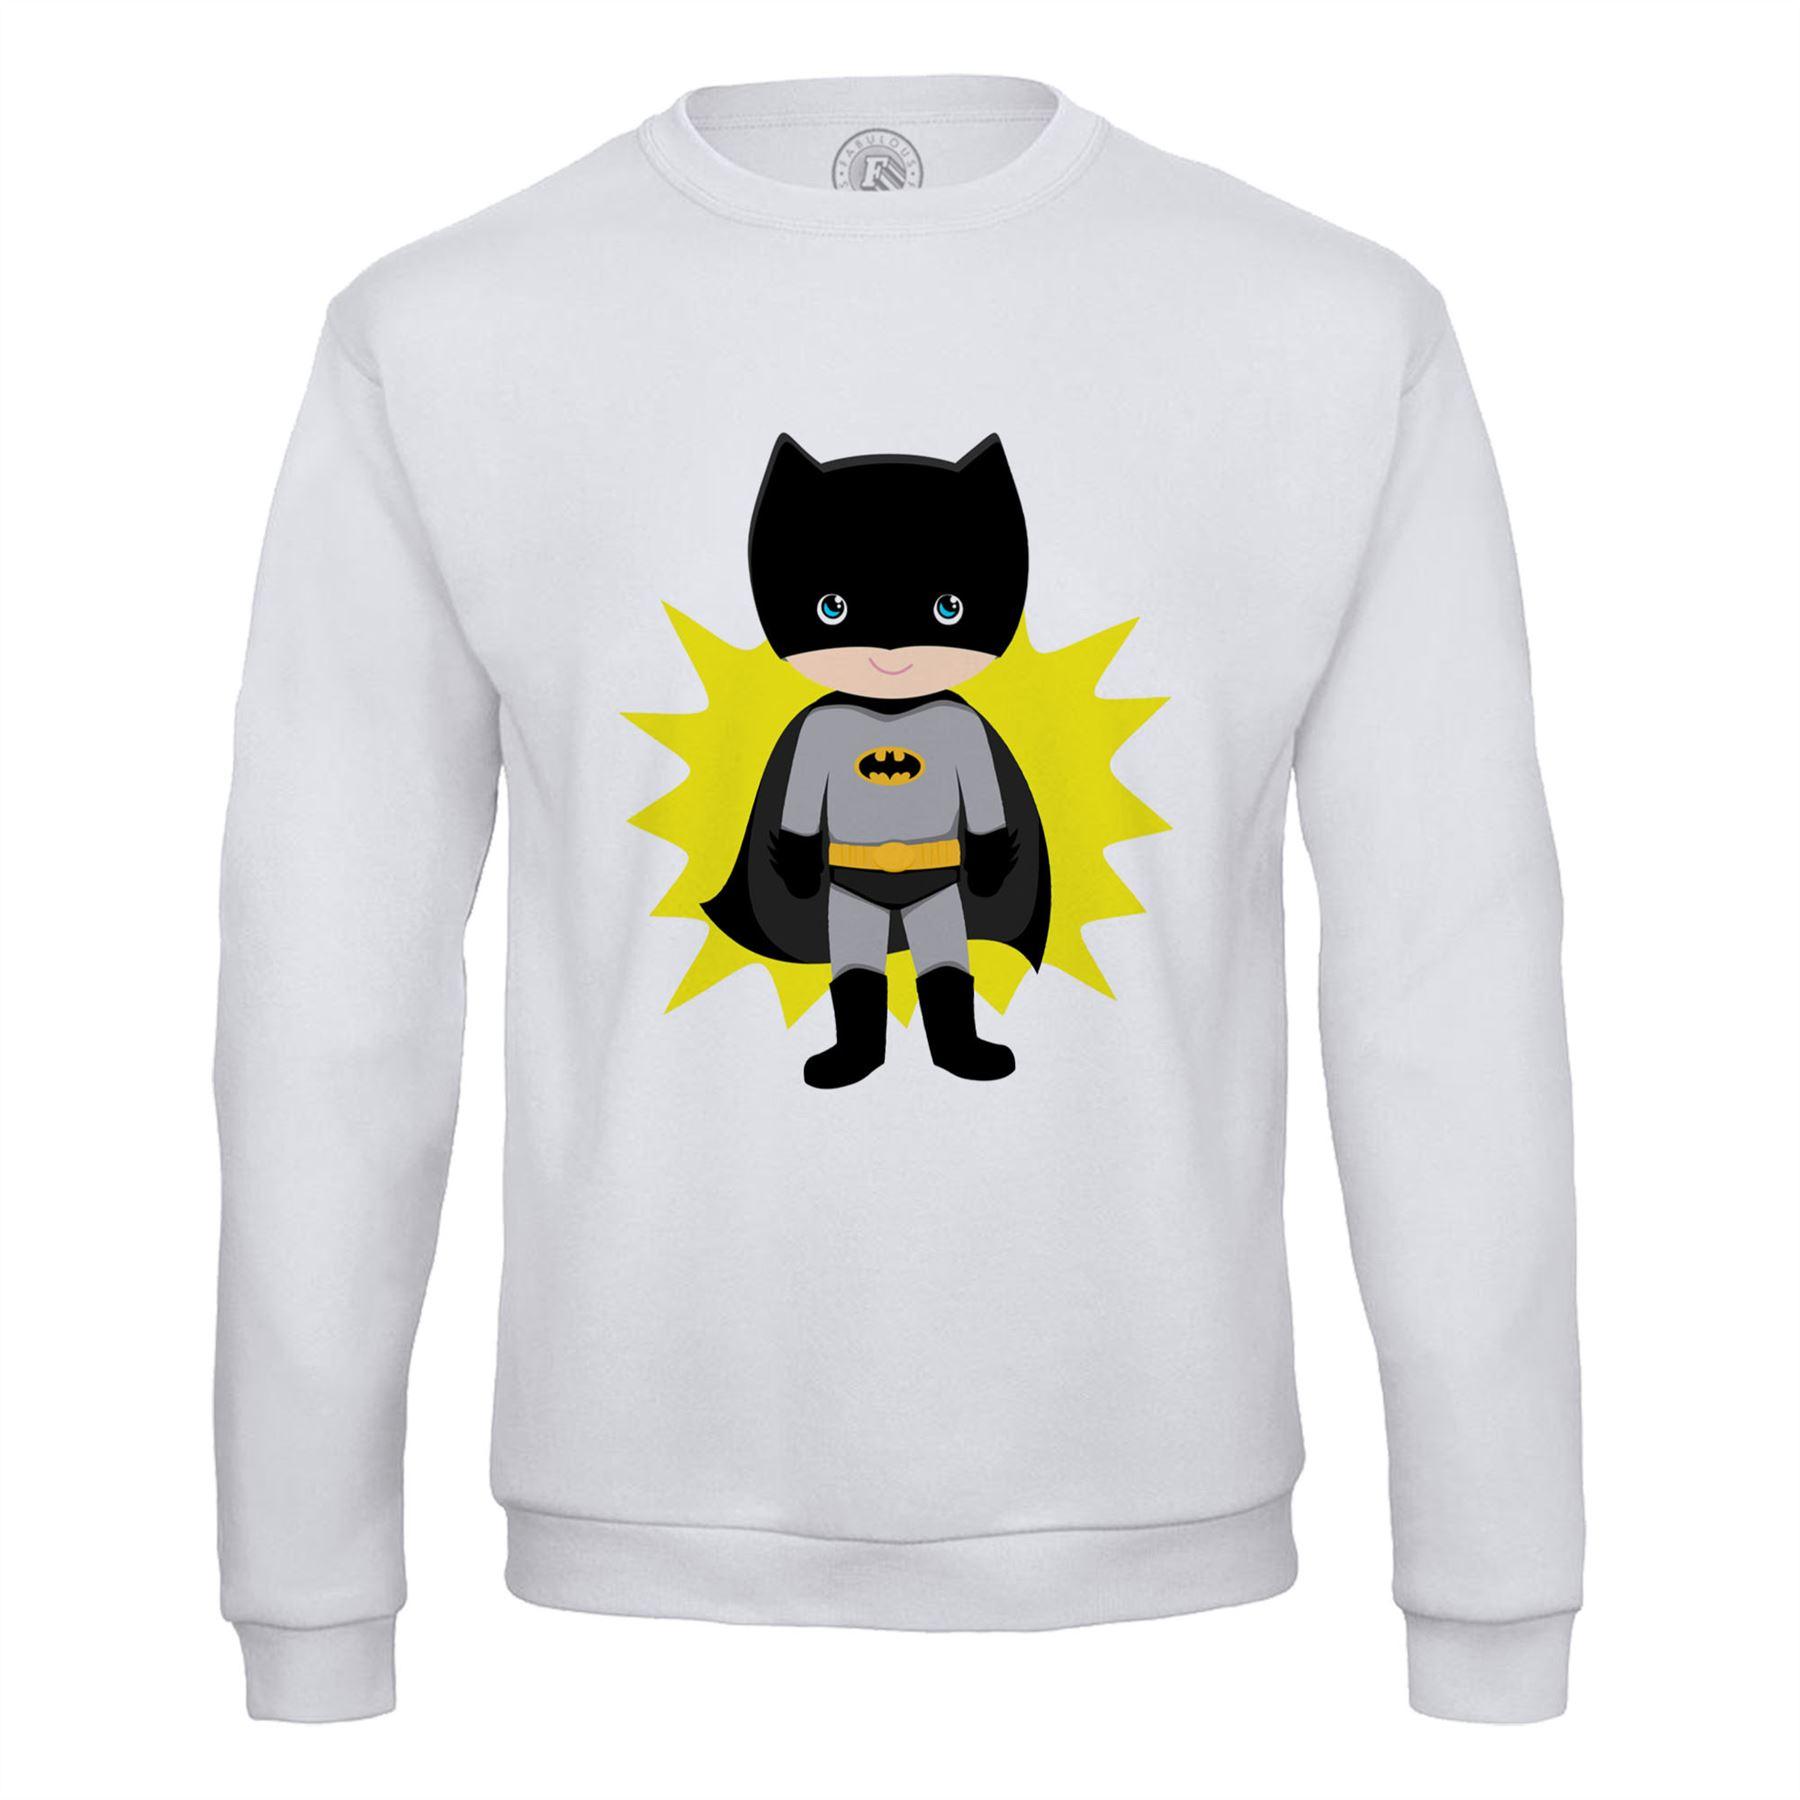 Sweat Shirt Homme Batboy Batman Garcon Enfant Dessin Mignon Super Hero Ebay